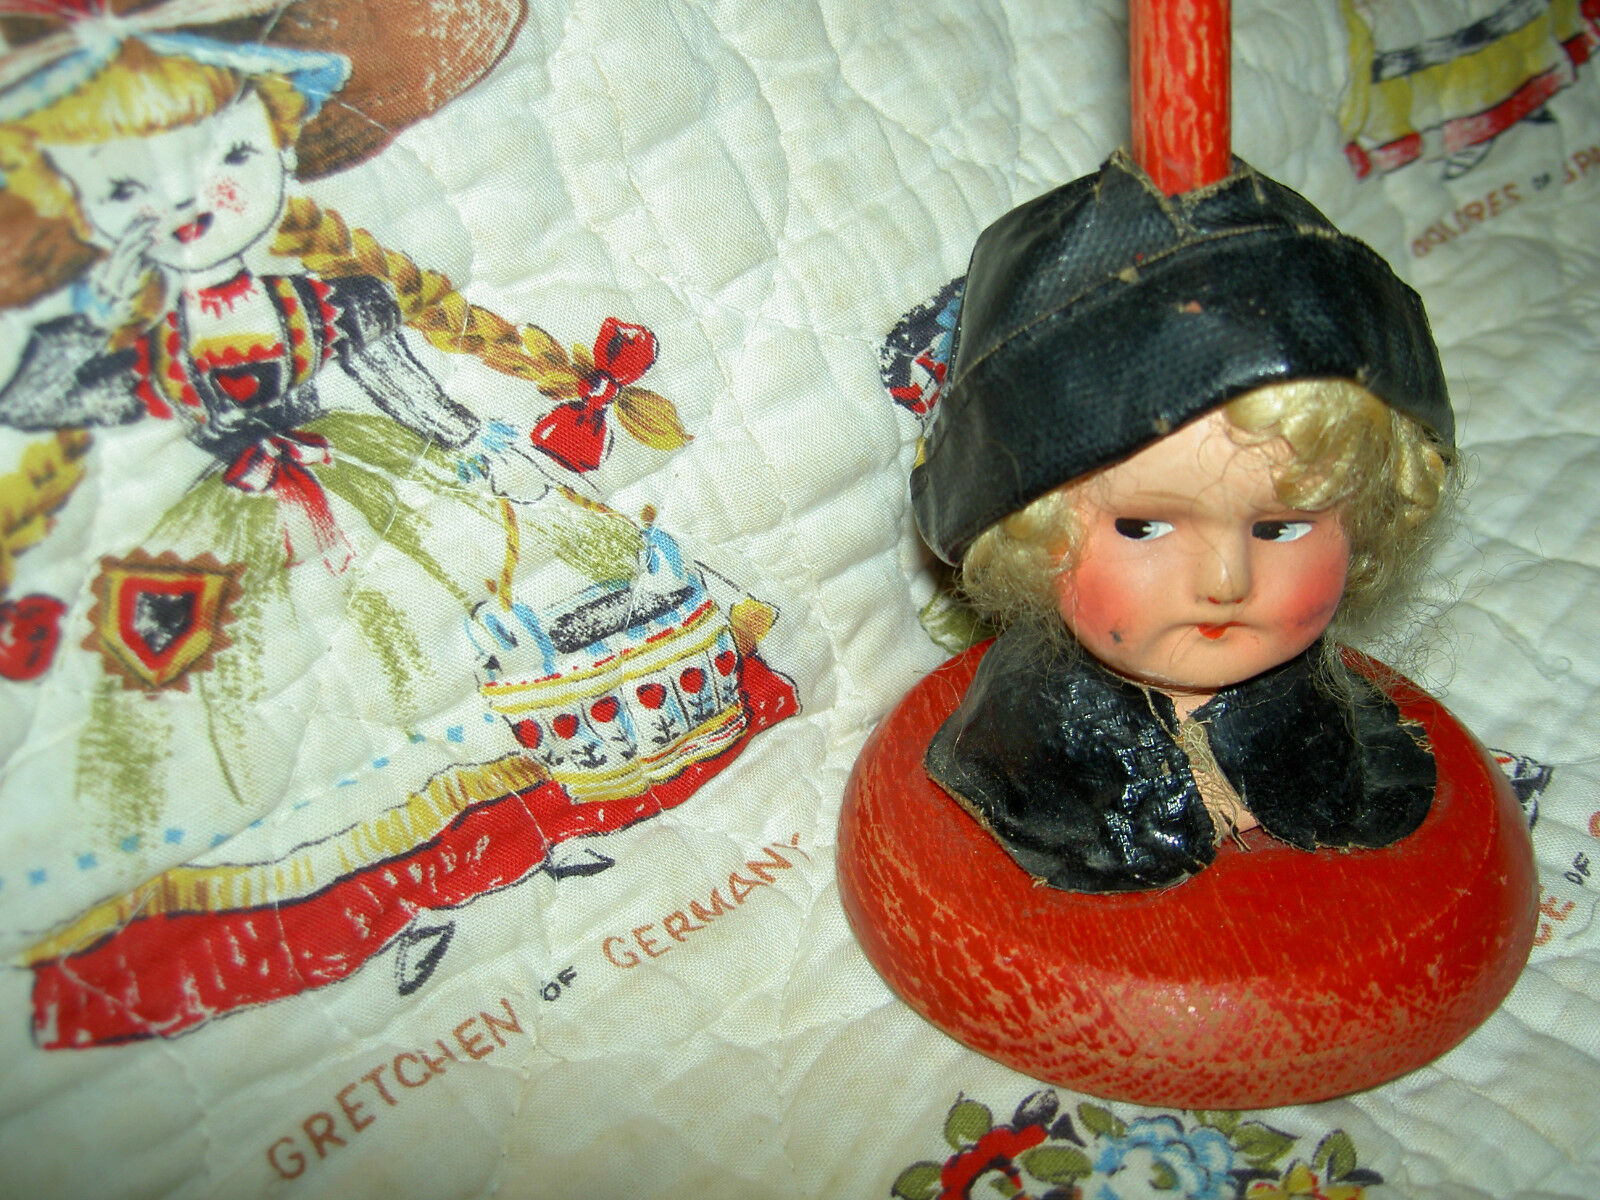 Adorable 1920s era German, Boudoir doll hat stand~original clothing & cloche hat